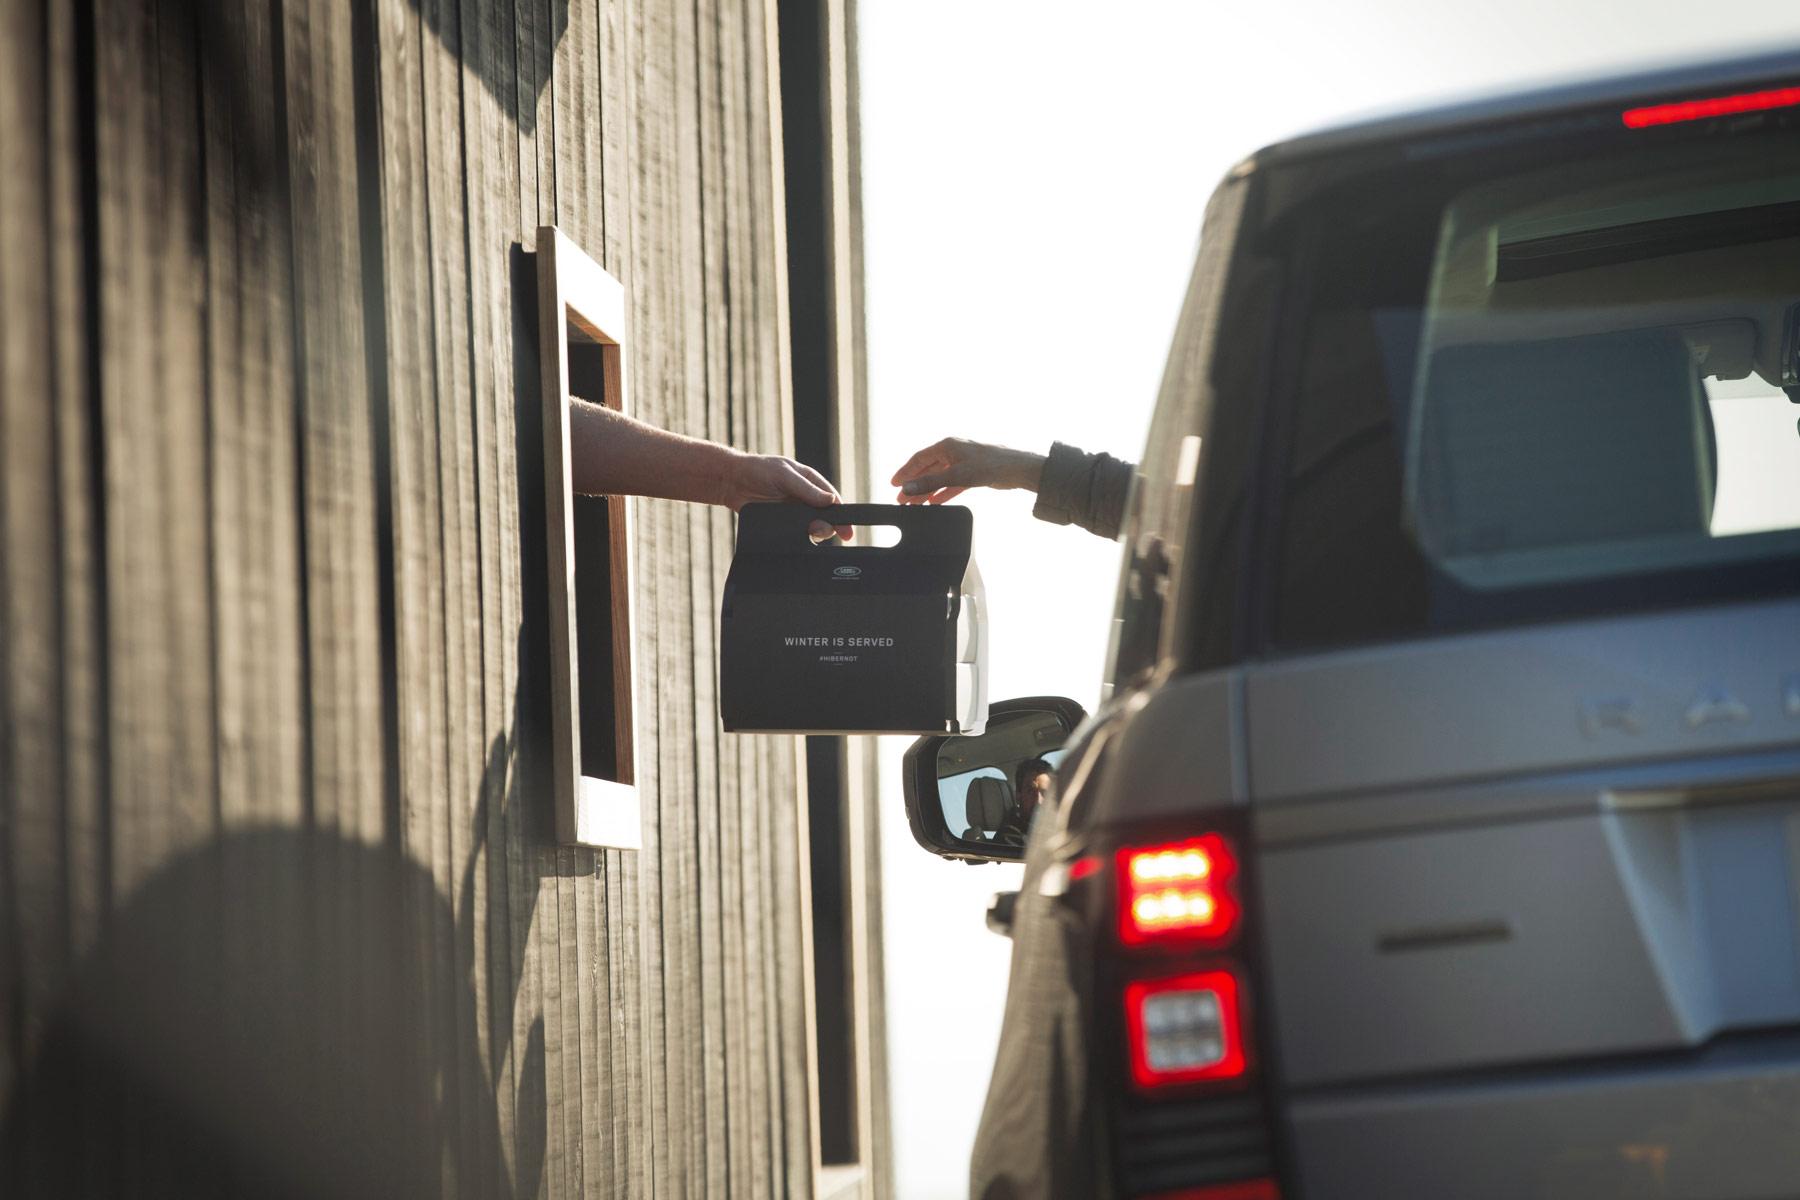 Land Rover & Chef Simon Rogan Create World's First Luxury Drive-Through 6